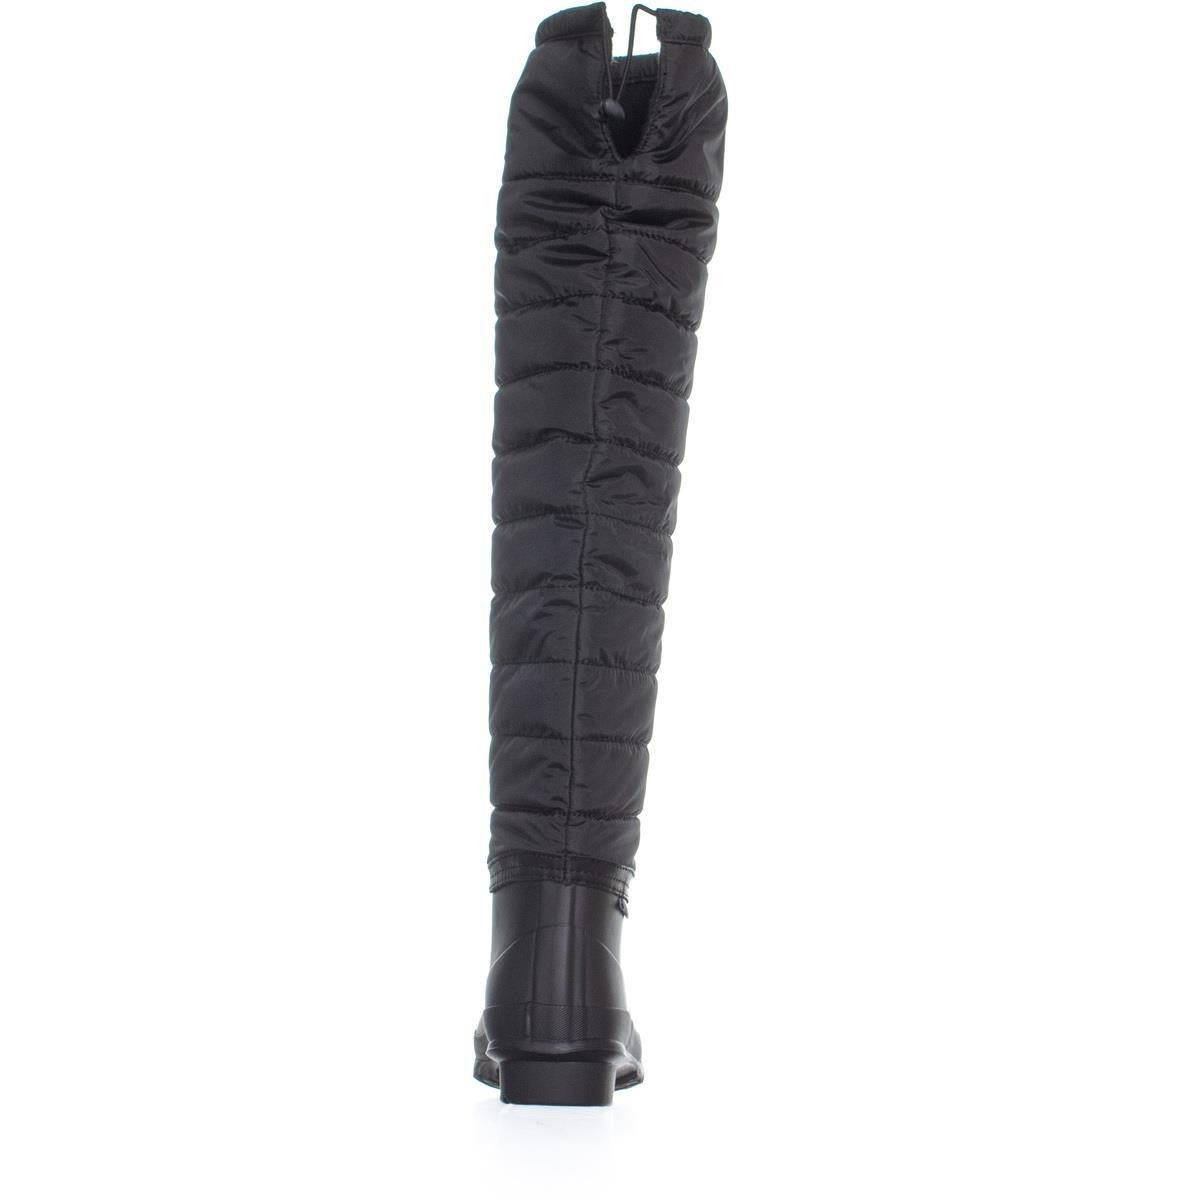 d1aecb05922 Shop Tretorn Harriet Over The Knee Rain Boots